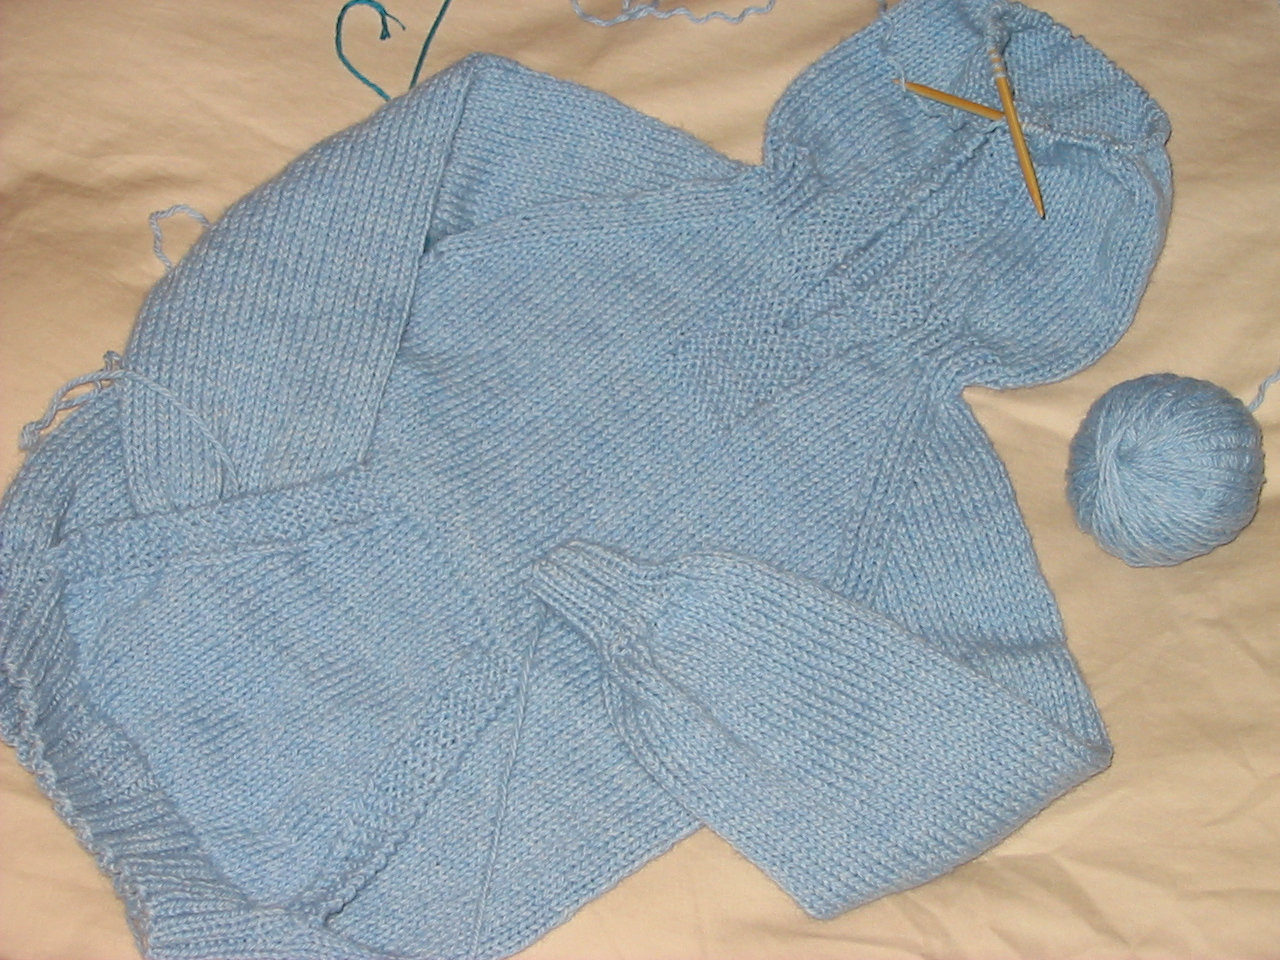 Knitting Pattern For Wallaby Sweater : YARN SCRAPS: Zachs Wonderful Wallaby